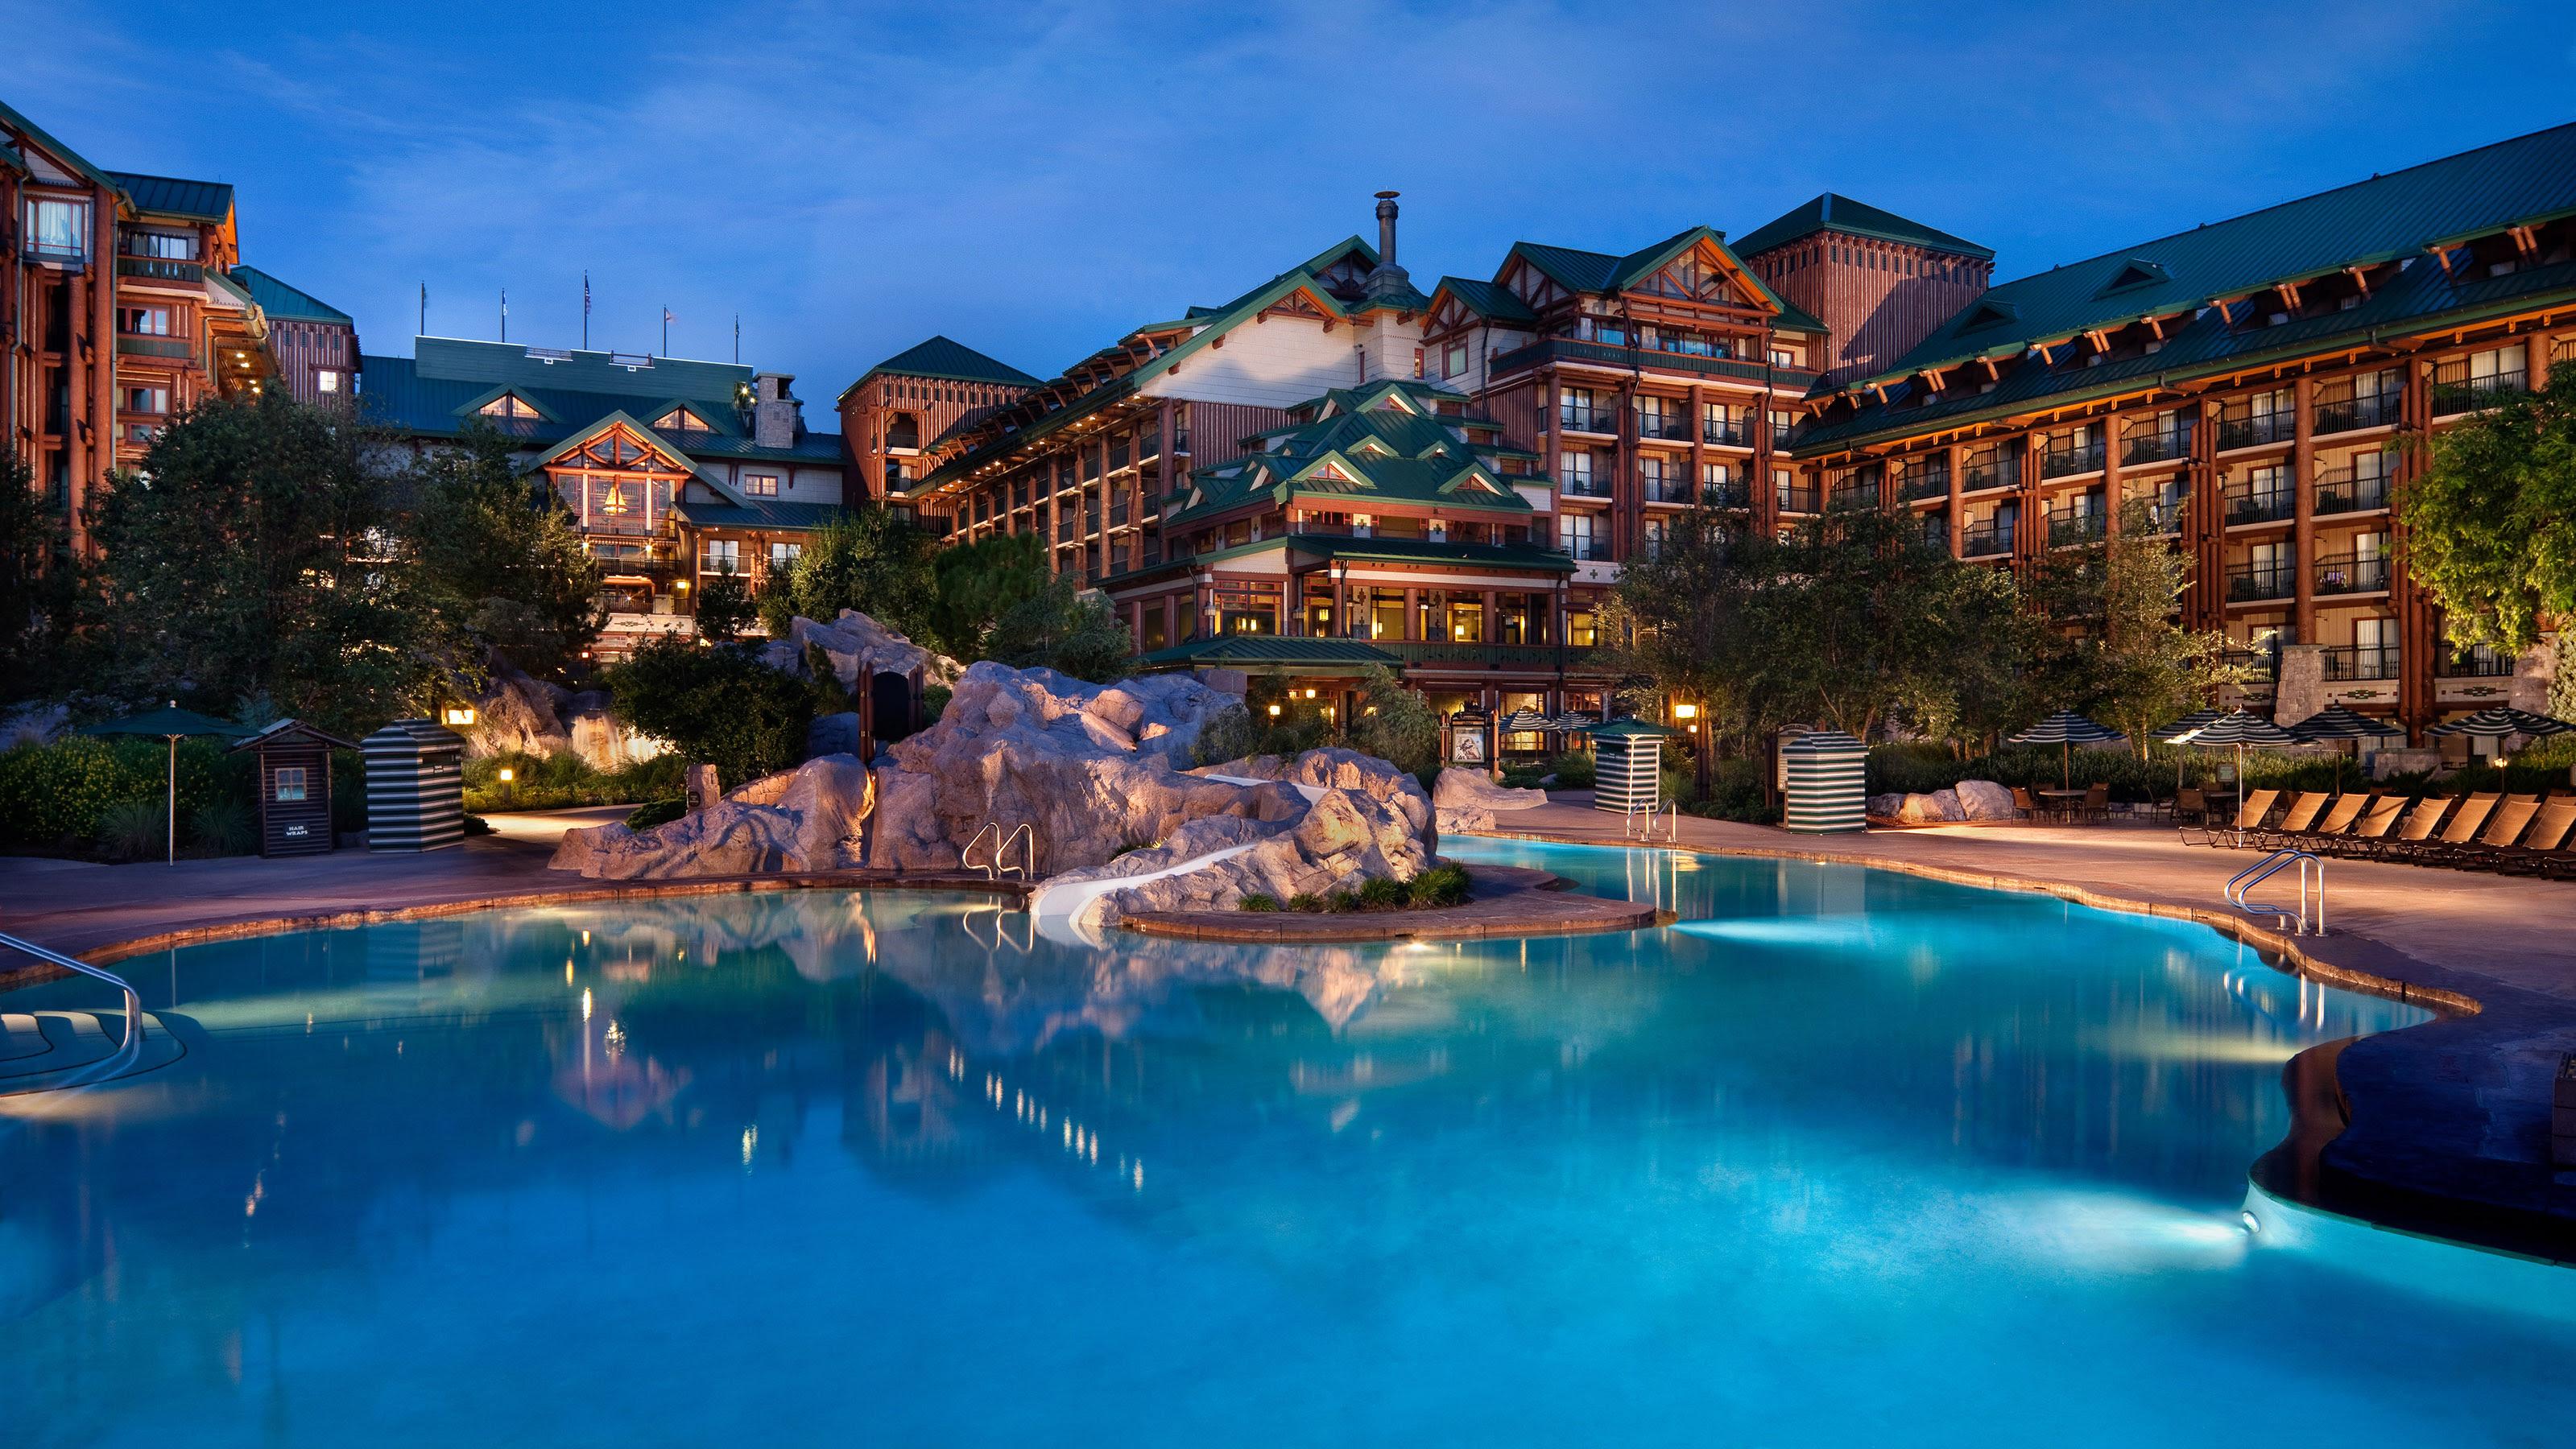 Disneys Wilderness Lodge Serene Luxury  Magical